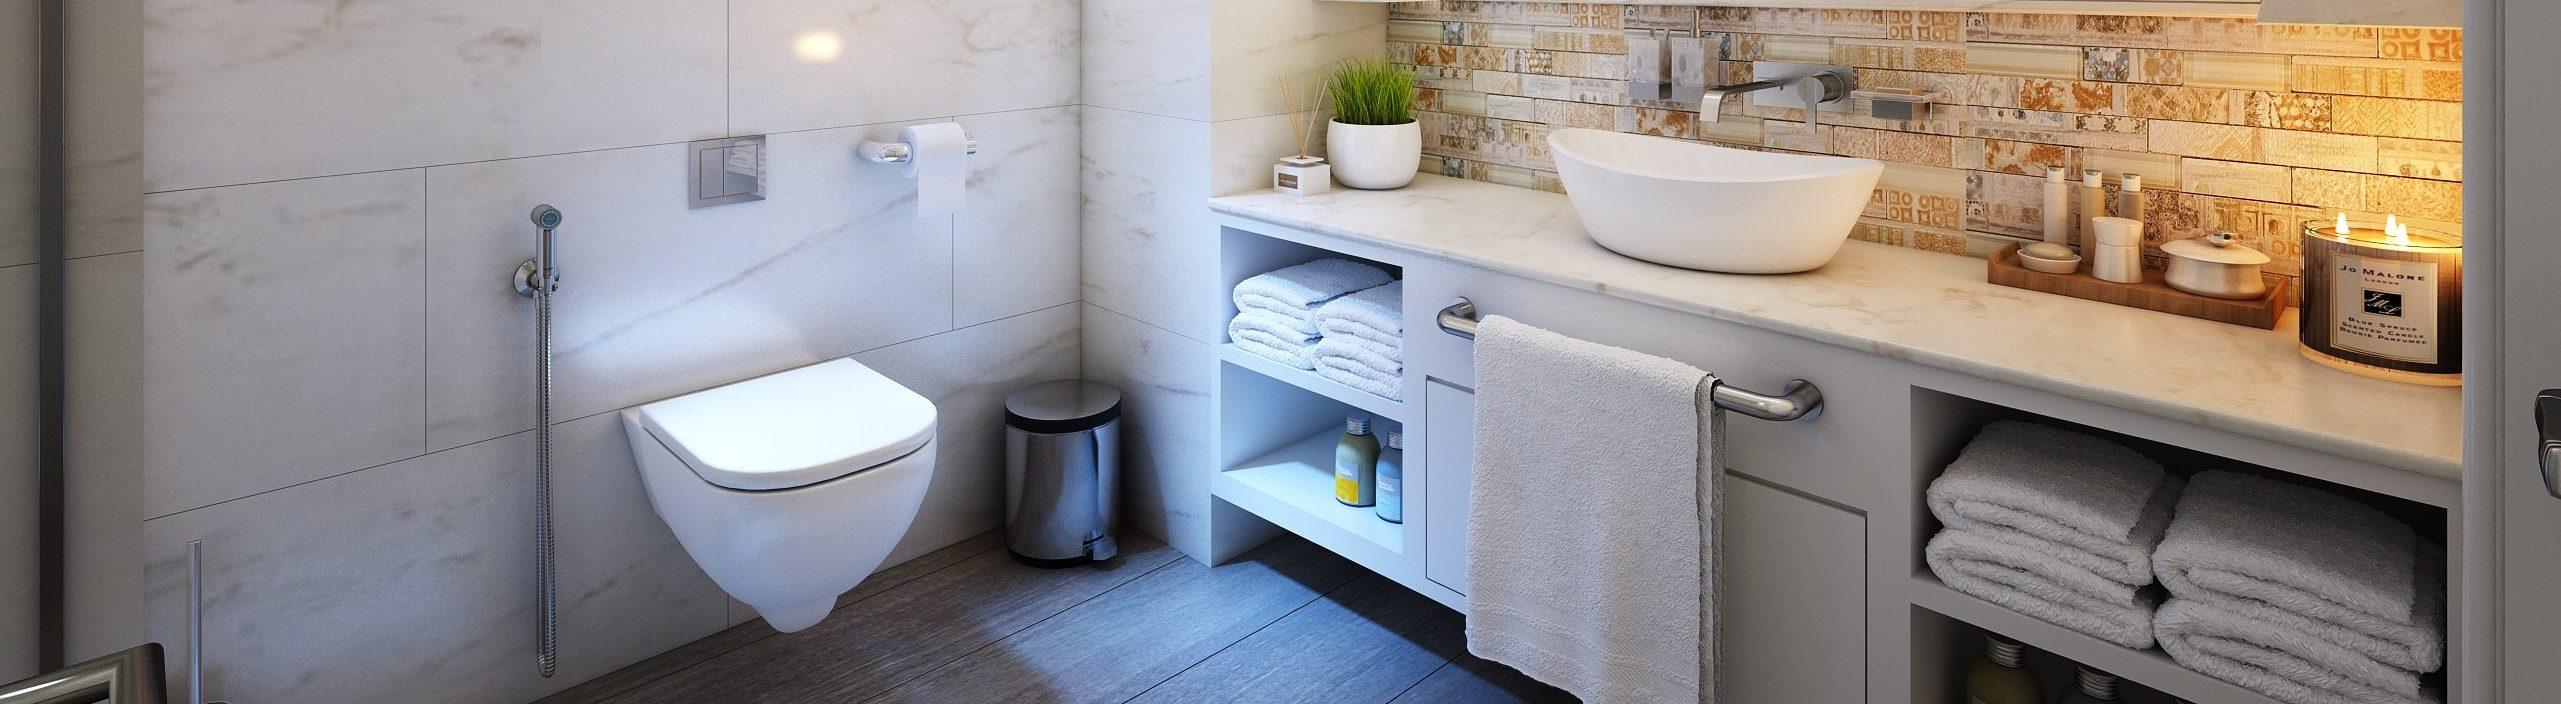 Design a classy bathroom – Tips an Tricks